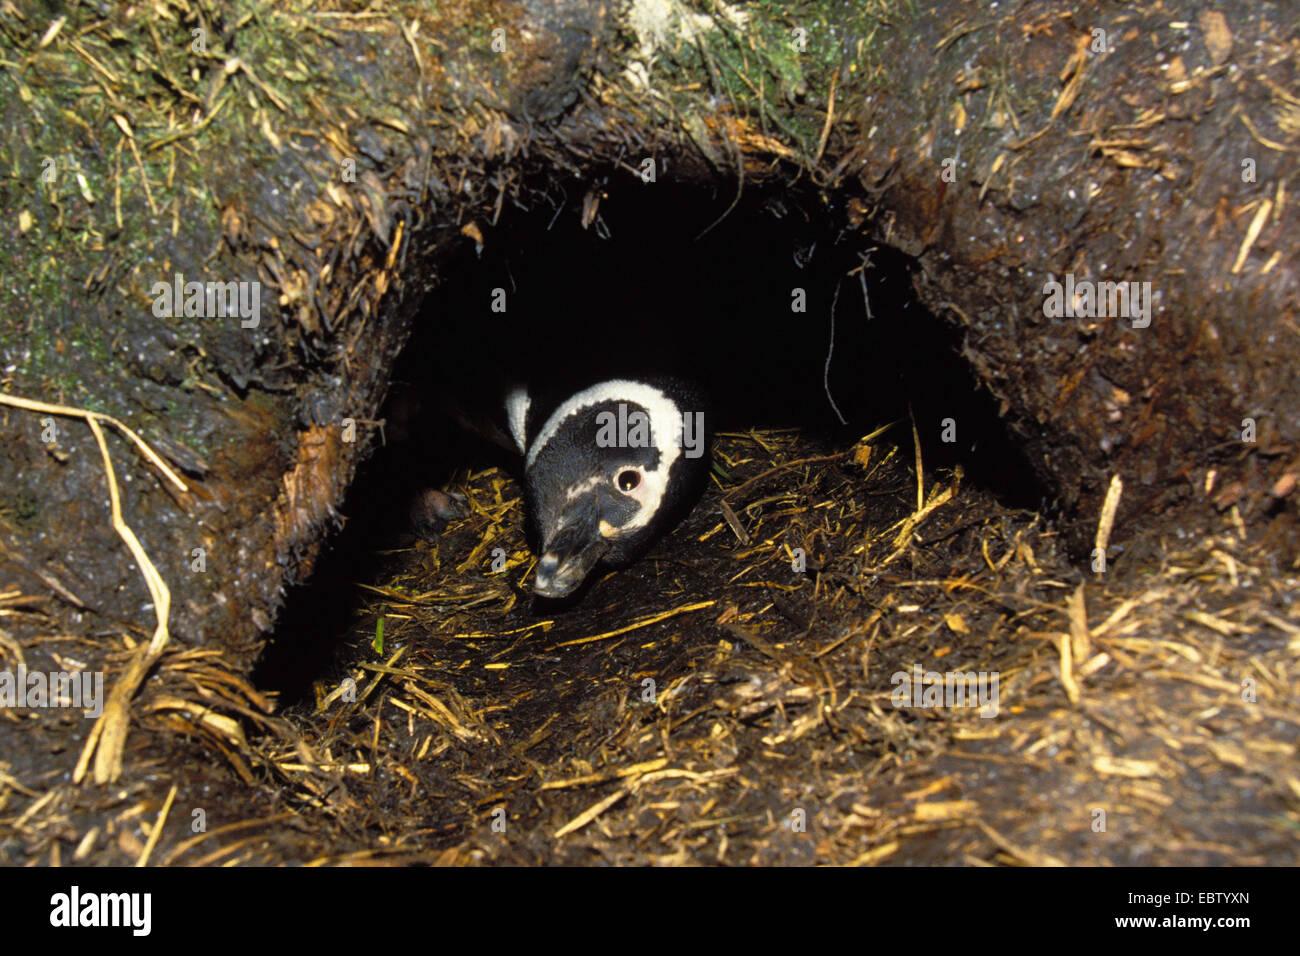 Magellanic penguin (Spheniscus magellanicus), peering from its den, Chile, Kap Hoorn - Stock Image